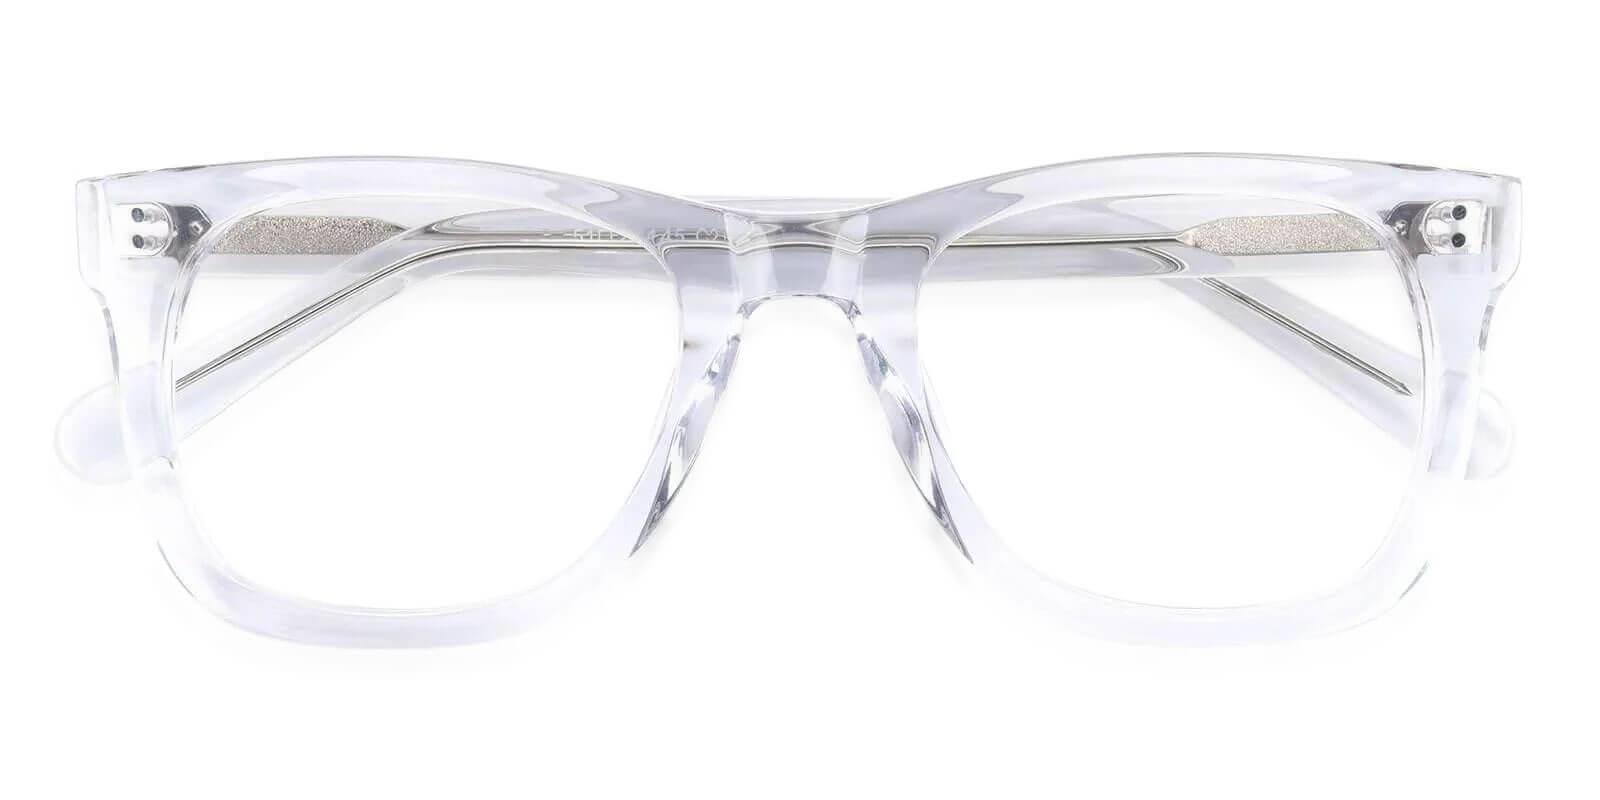 Dean Translucent Acetate Eyeglasses , UniversalBridgeFit Frames from ABBE Glasses